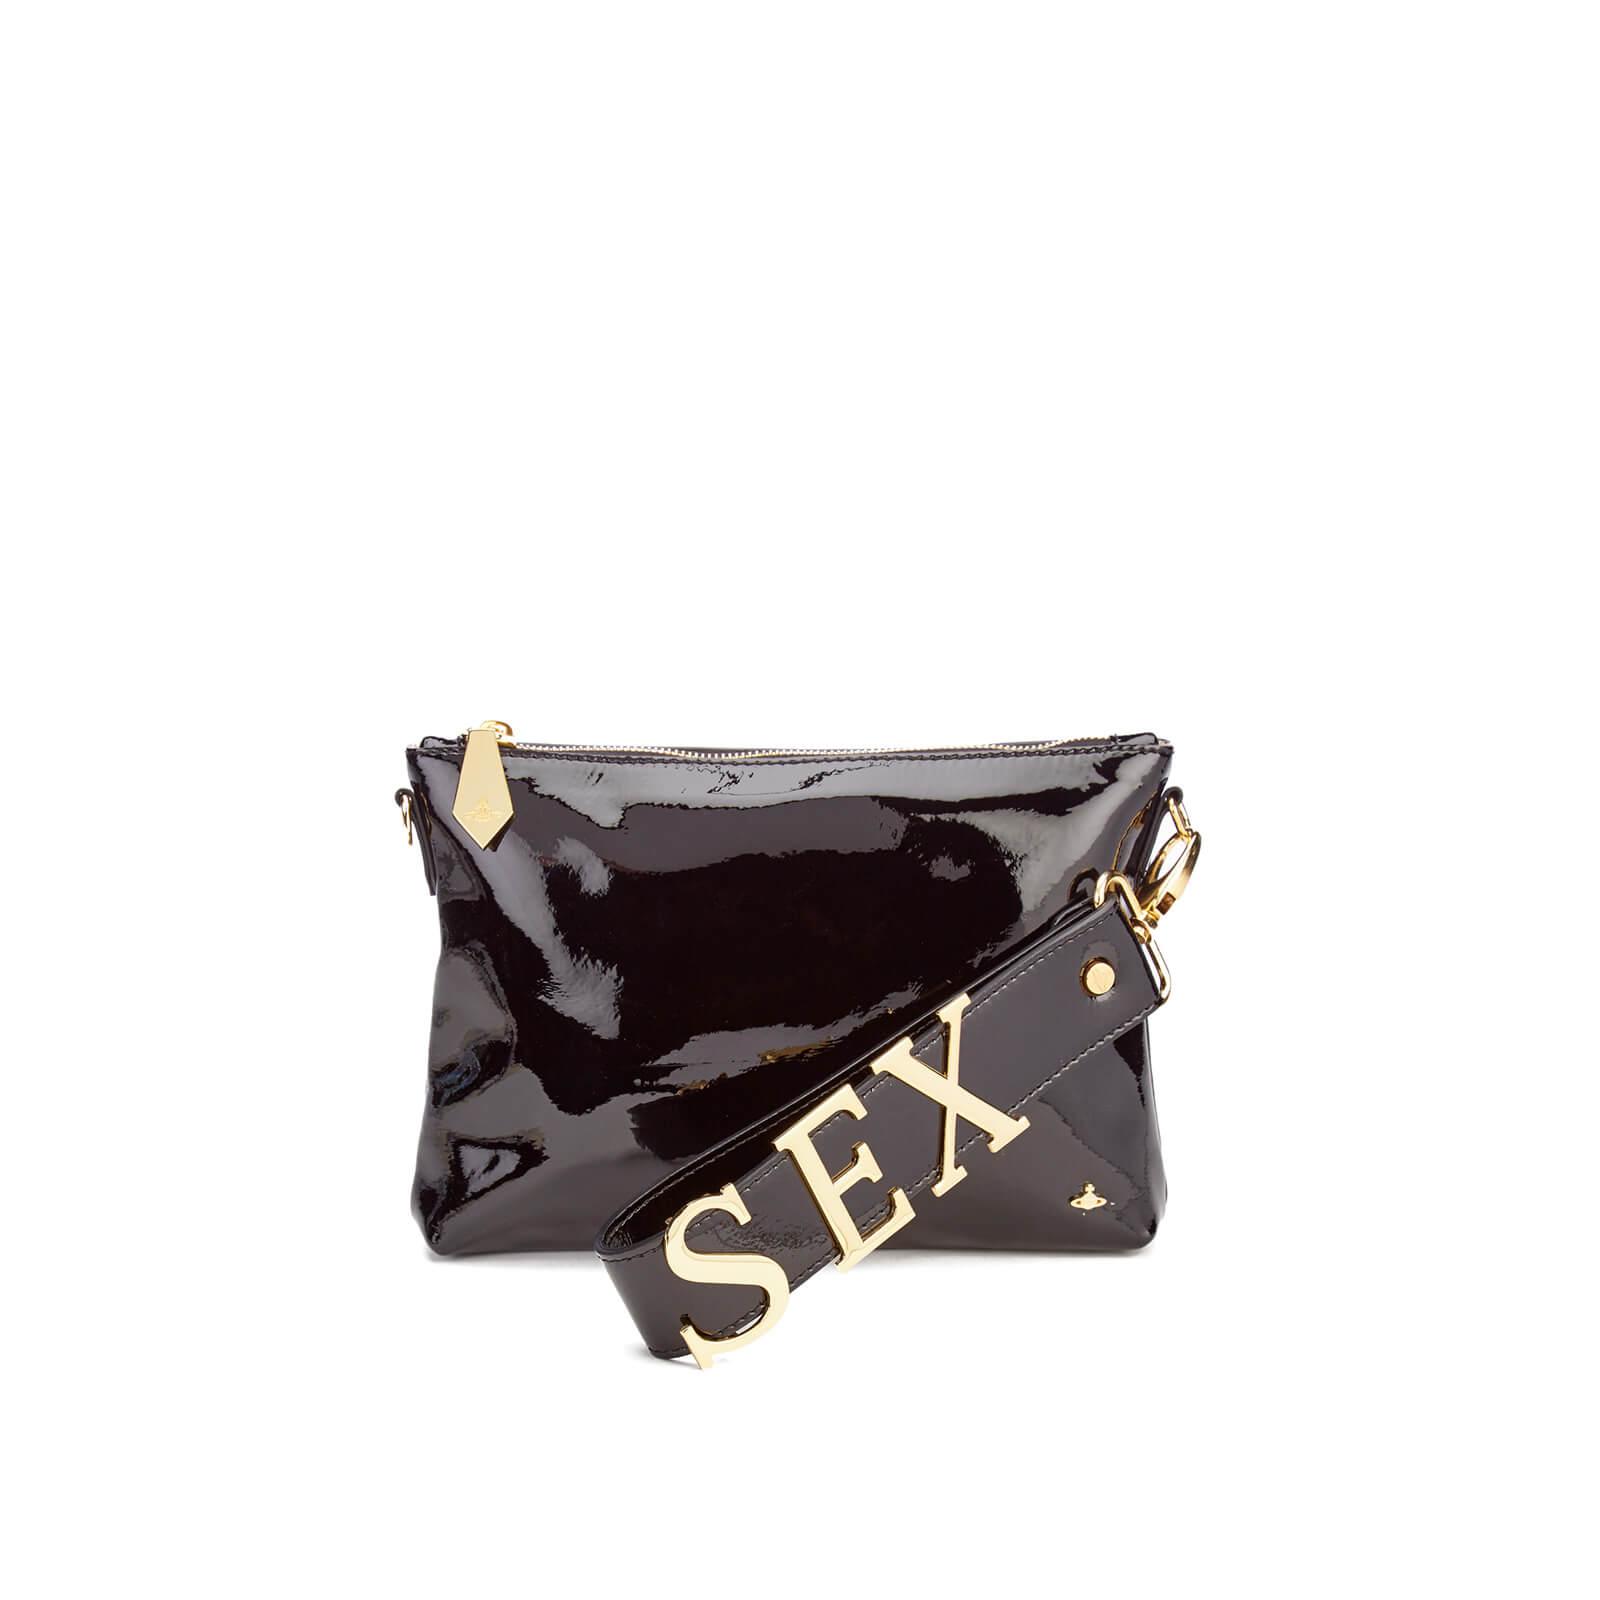 455fedcb54 Vivienne Westwood Women's Nappa Bag - Black - Free UK Delivery over £50